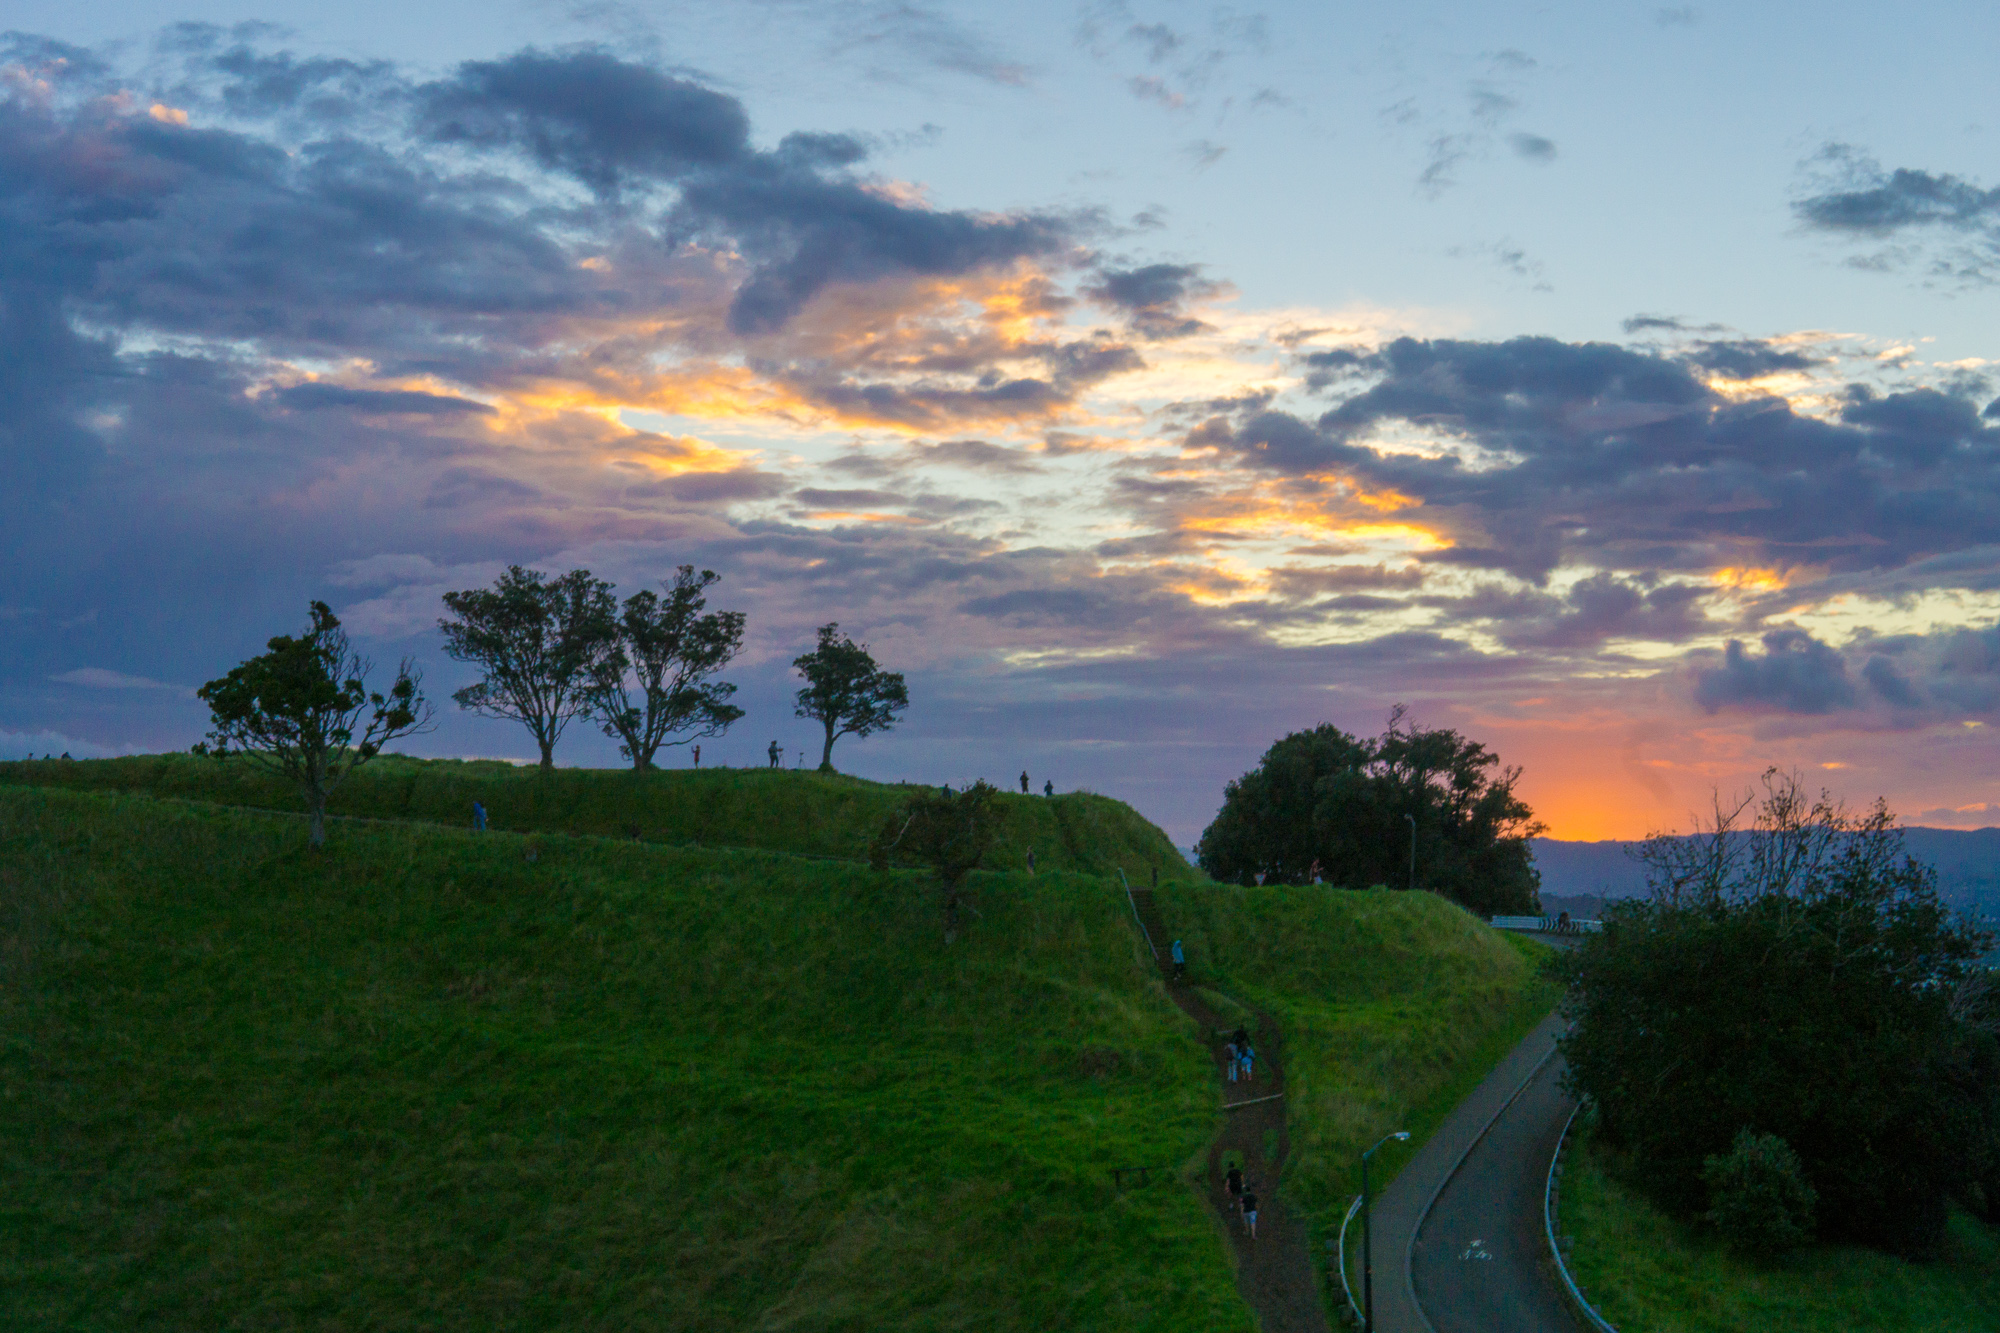 Sunset on Mount Eden 12 hours later.